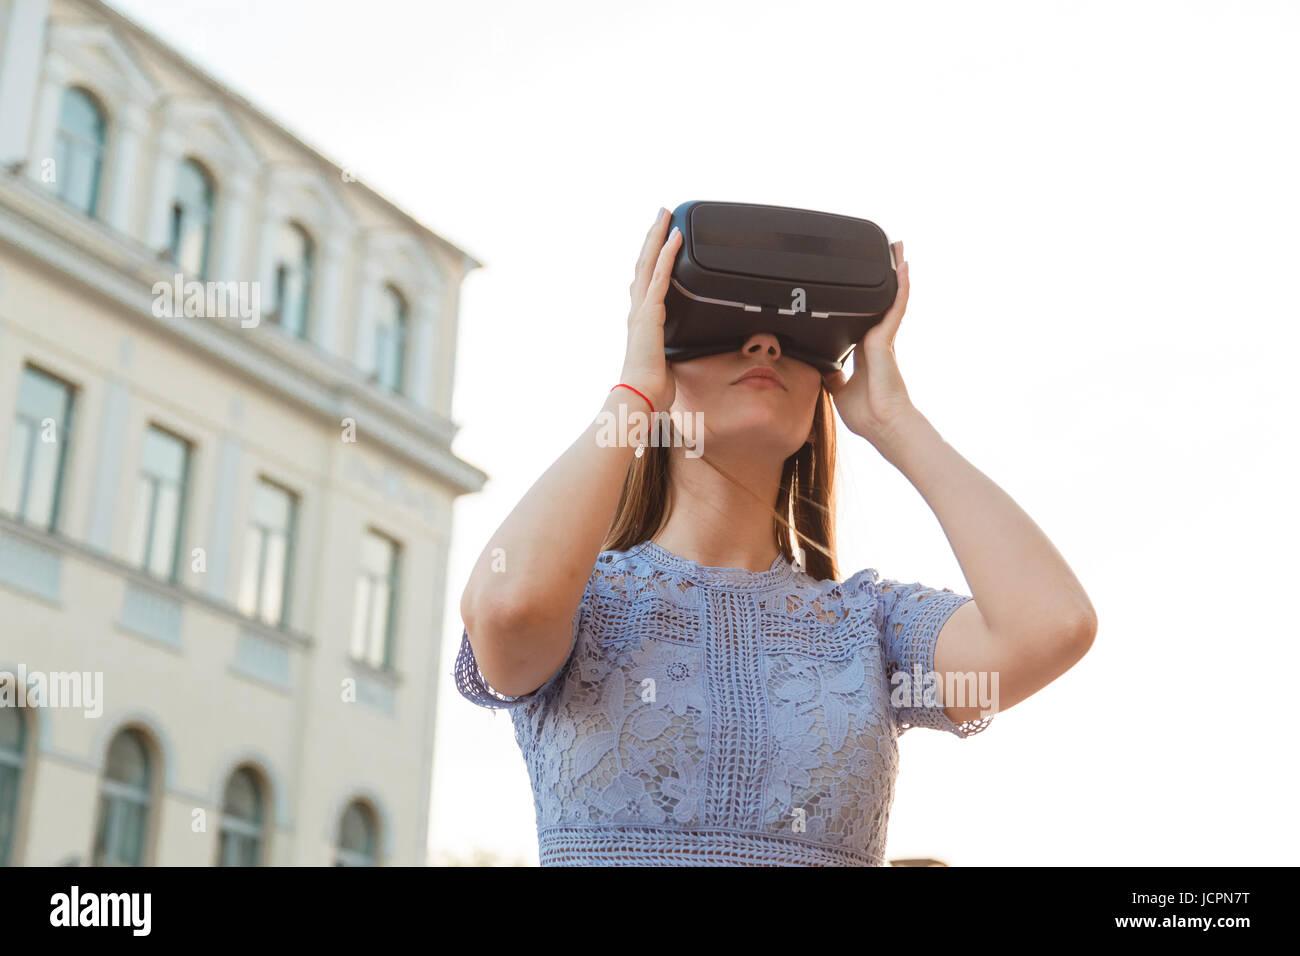 Futurist Futuristic Modern Stockfotos & Futurist Futuristic Modern ...